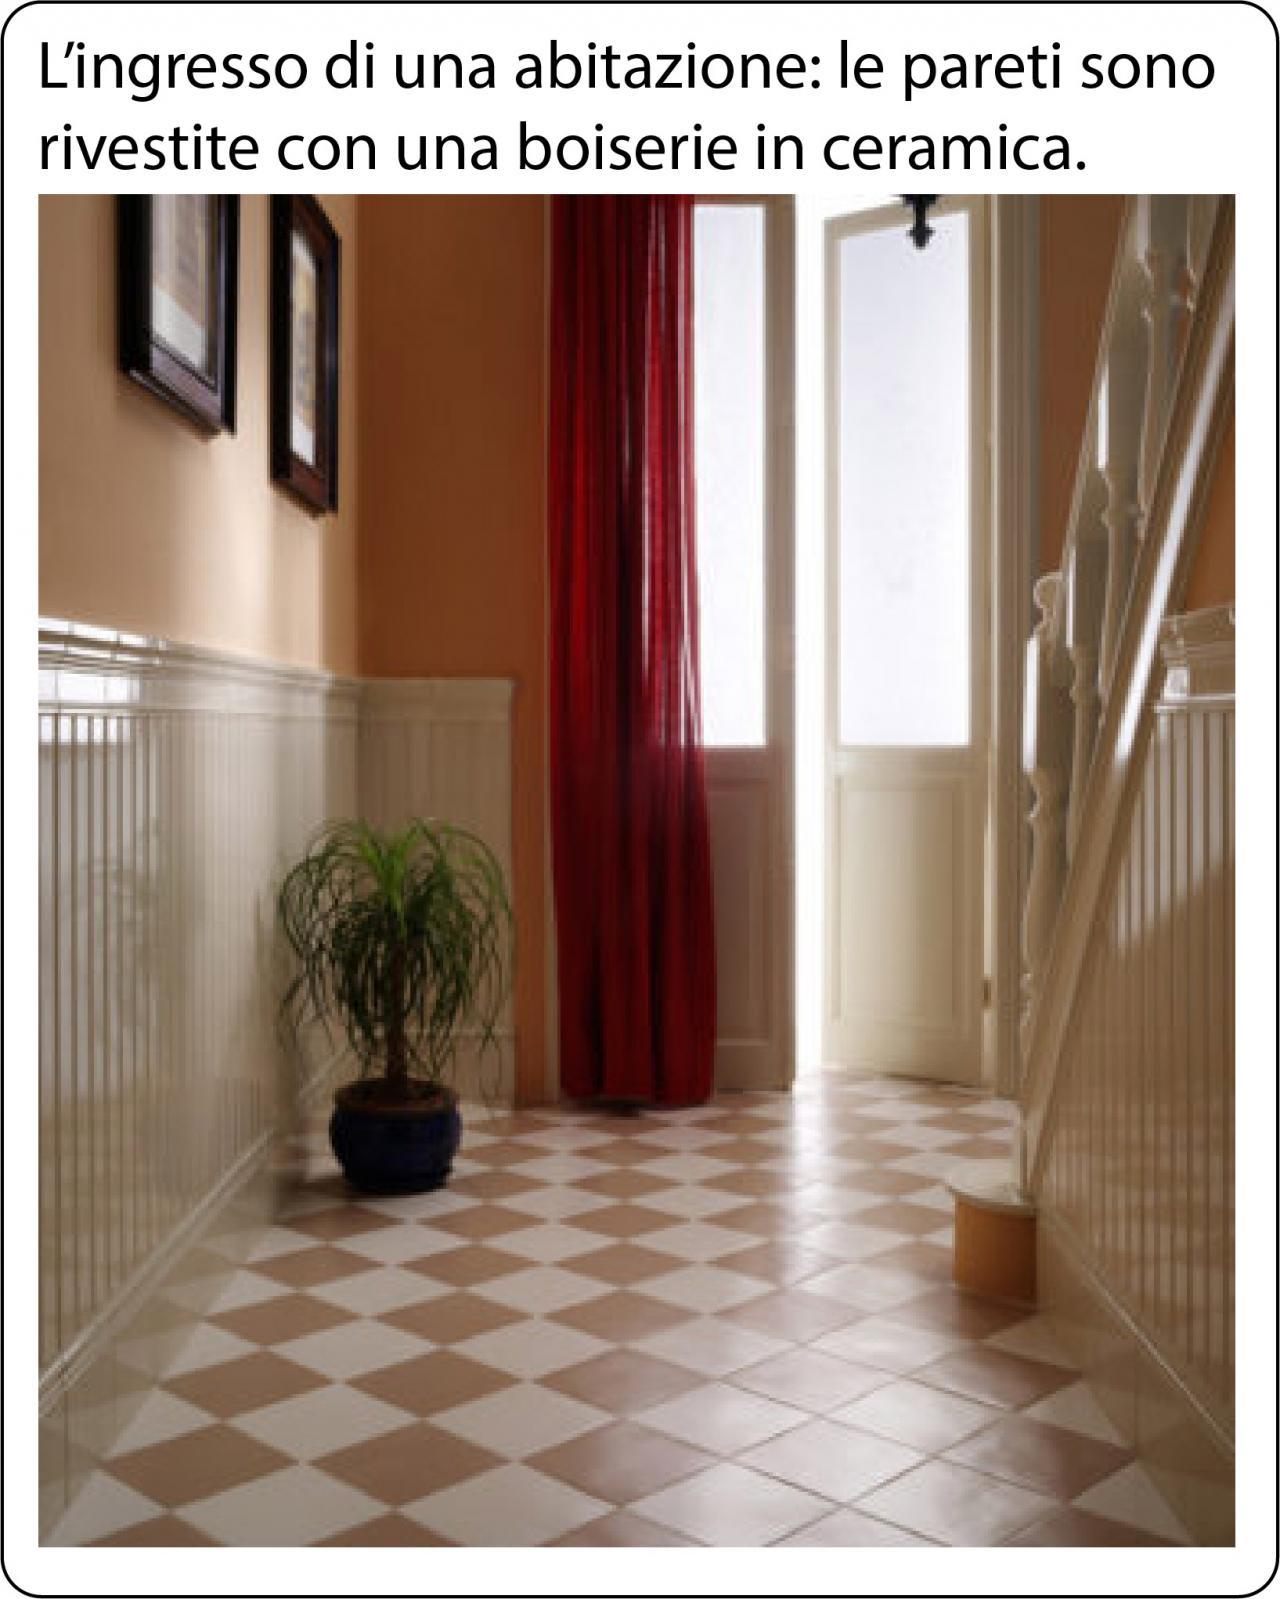 Boiserie in ceramica nel bagno moderno fratelli pellizzari - Piastrelle in inglese ...